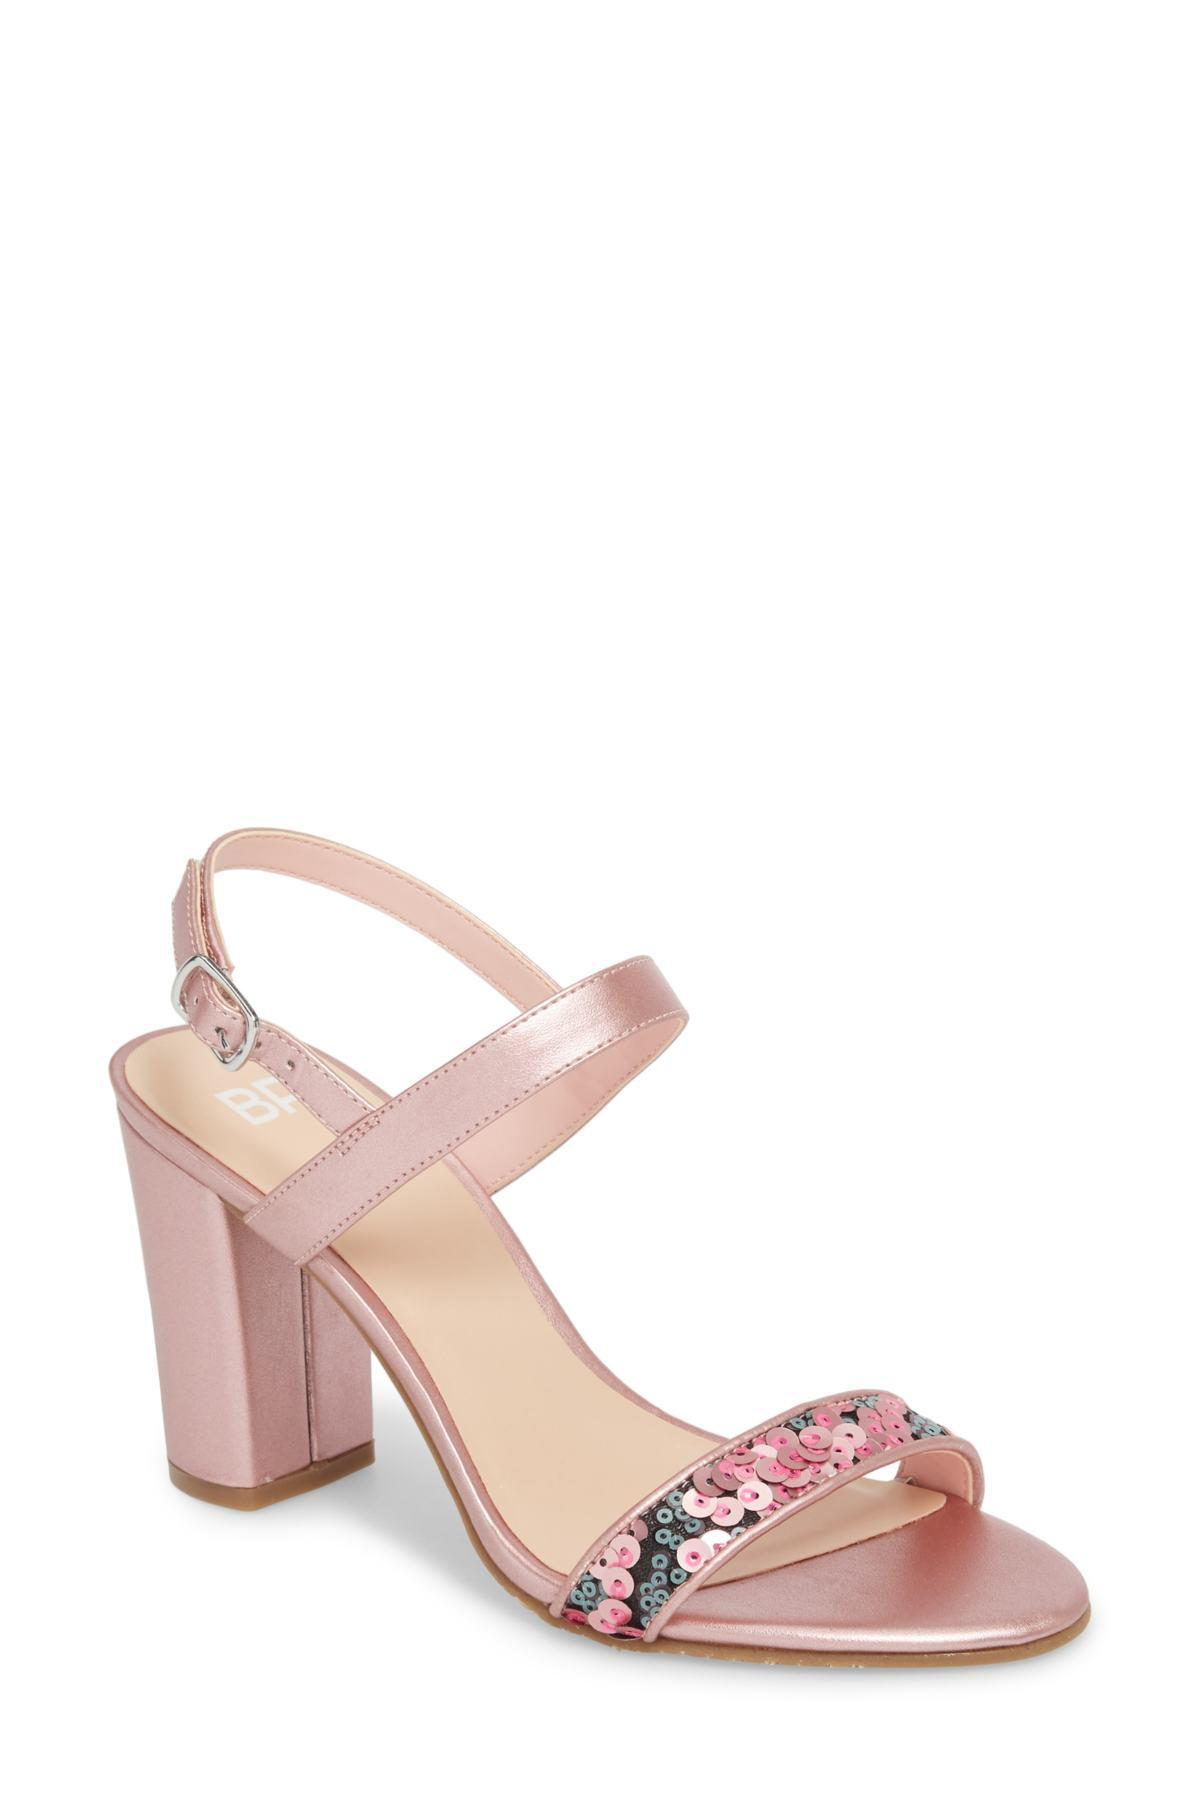 8b124fed6c88 Lyst - BP. Lula Block Heel Slingback Sandal (women) in Pink